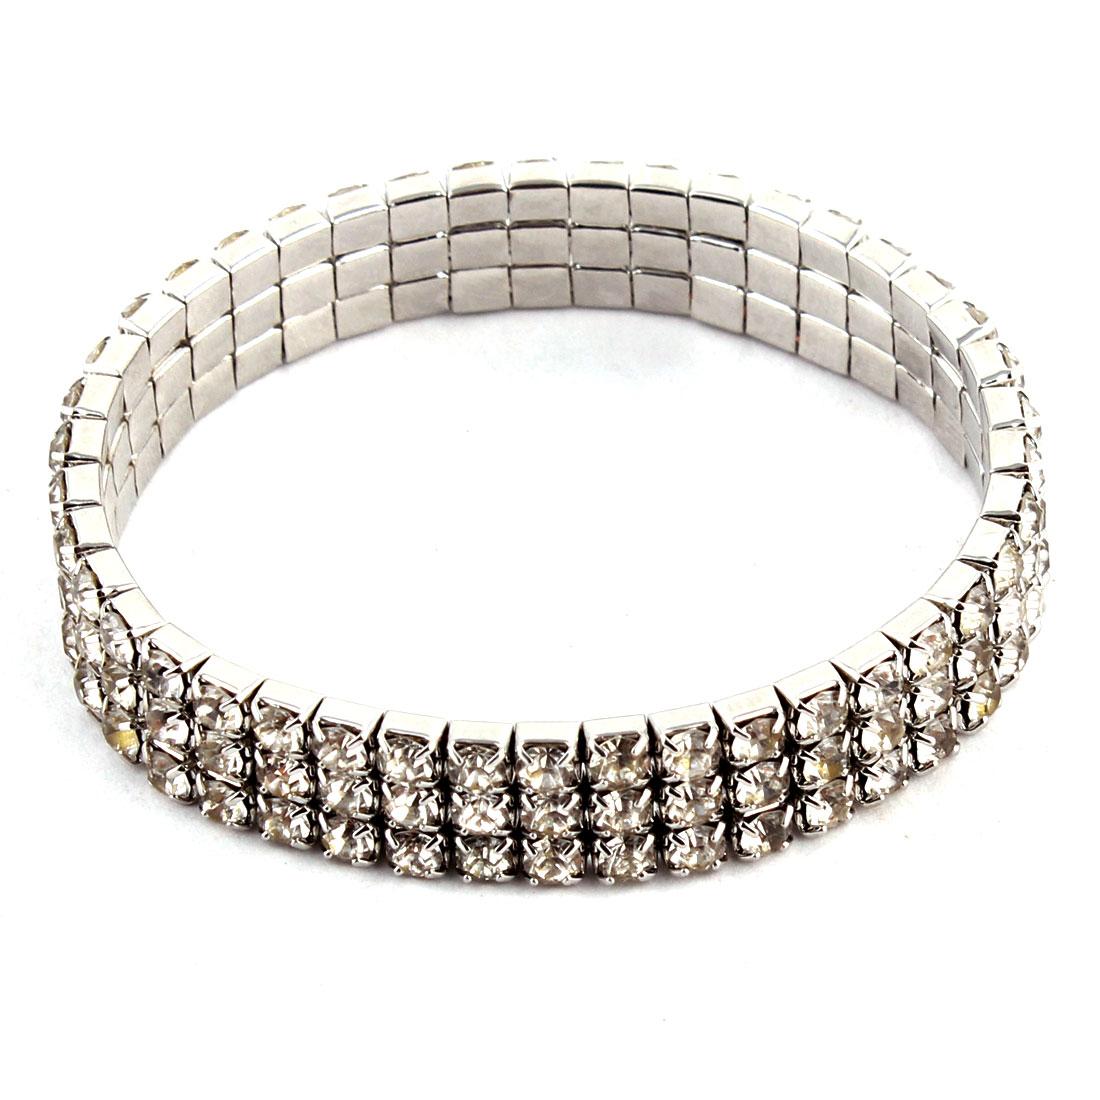 Dog Metal Three Rows Beads Linked Plastic Rhinestone Inlaid Elastic Necklace